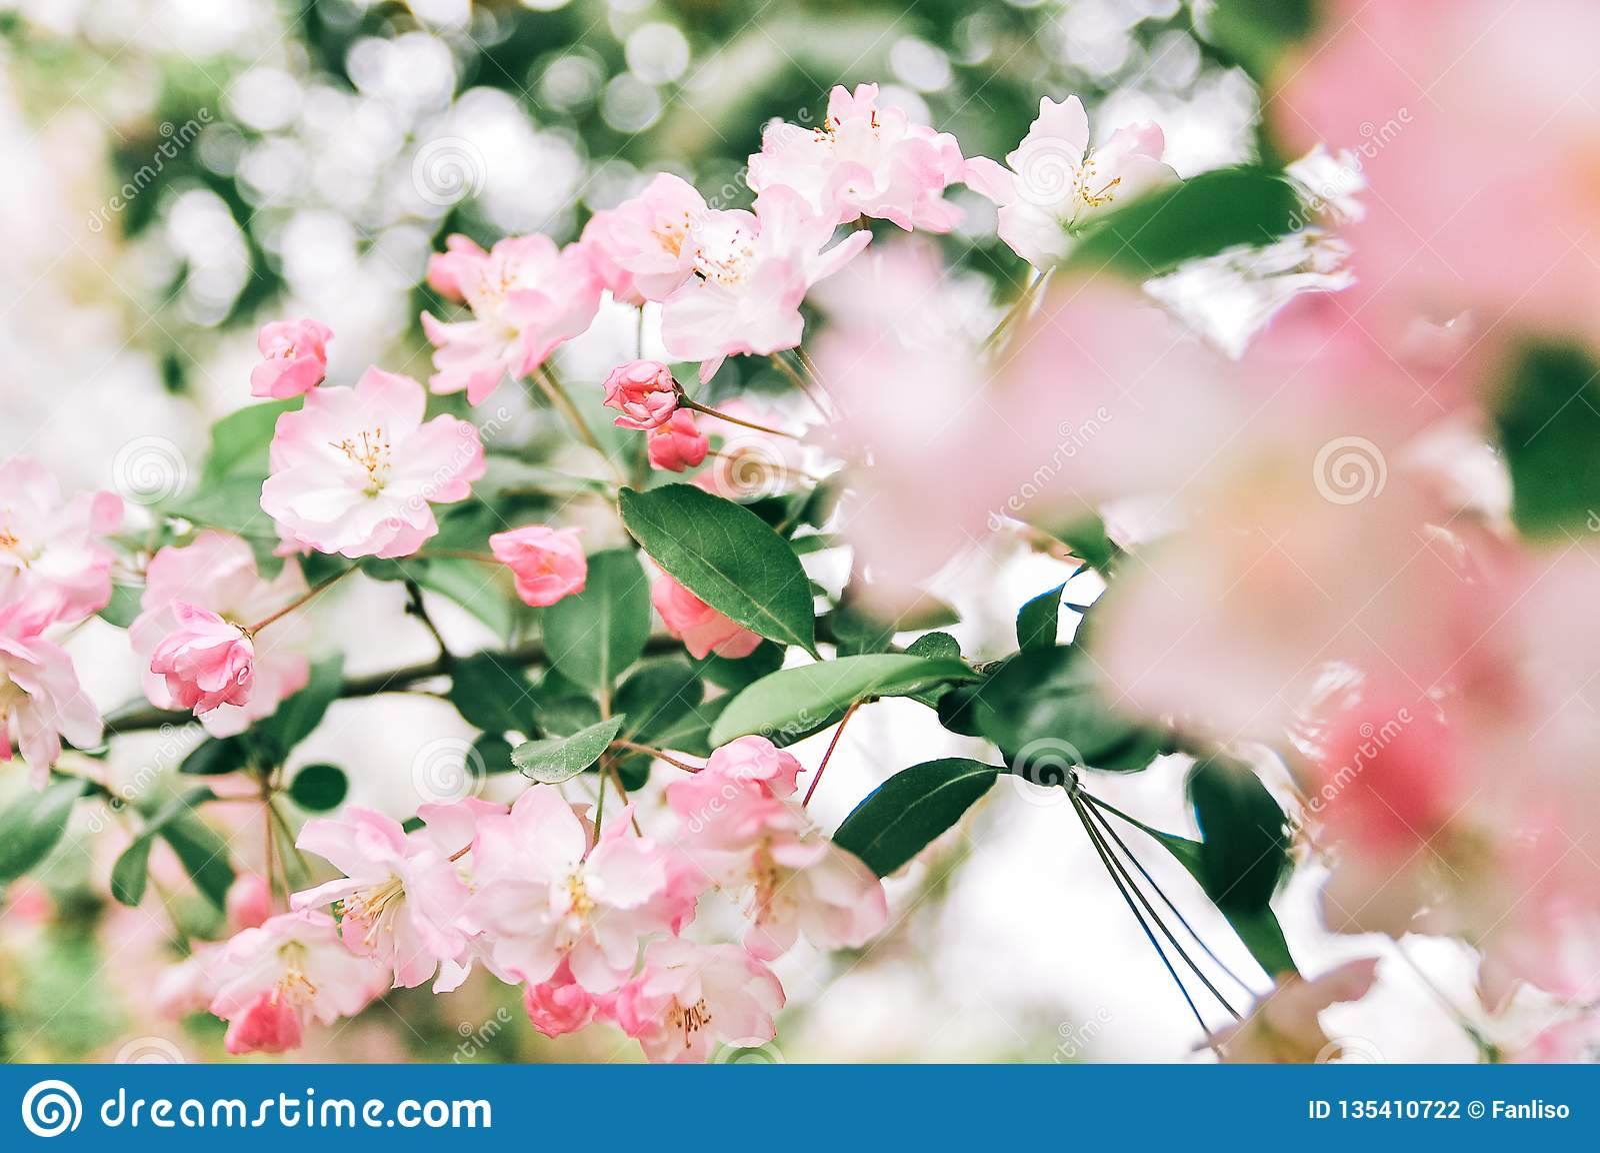 Flowering Crabapple Malus Halliana Or Begonia Pink Flower